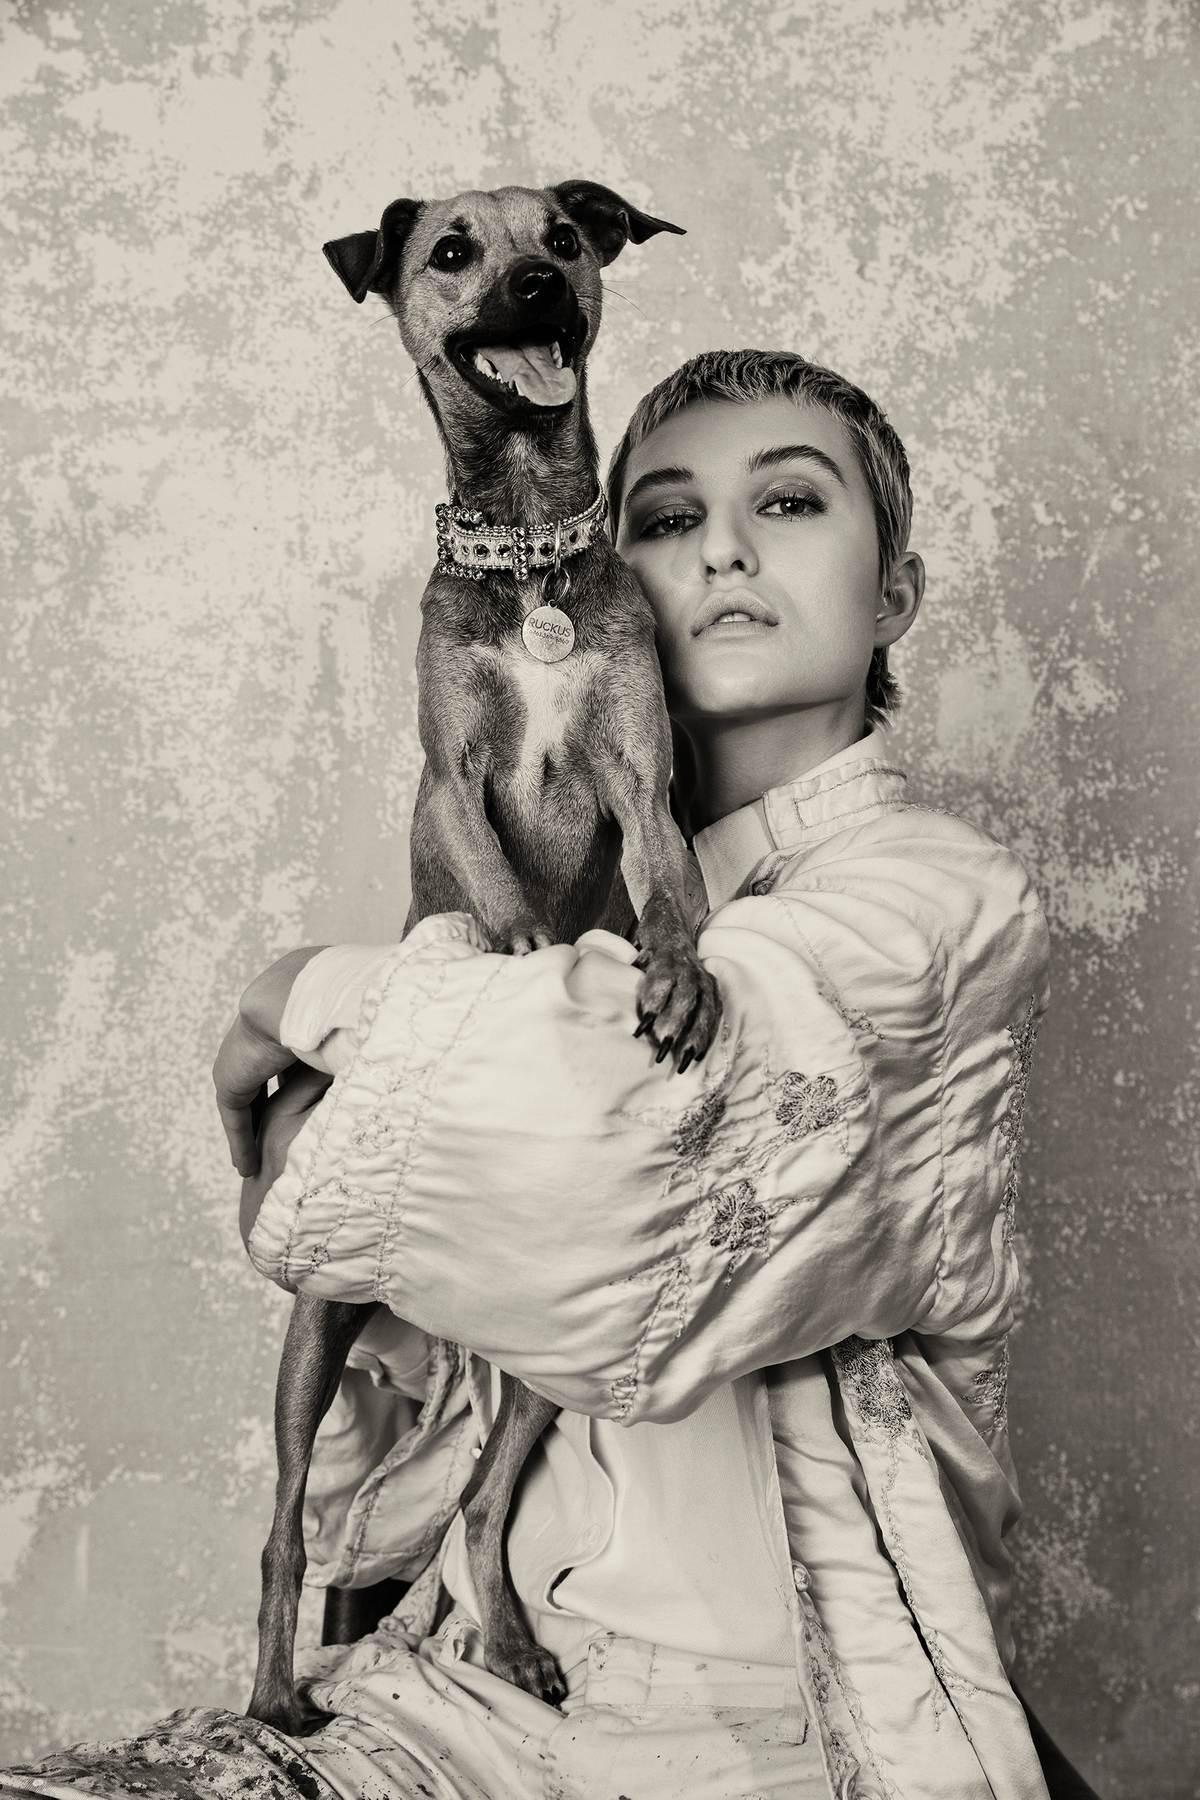 artagee/dog/portrait/sepia/classic/losangeles/photographer.jpg